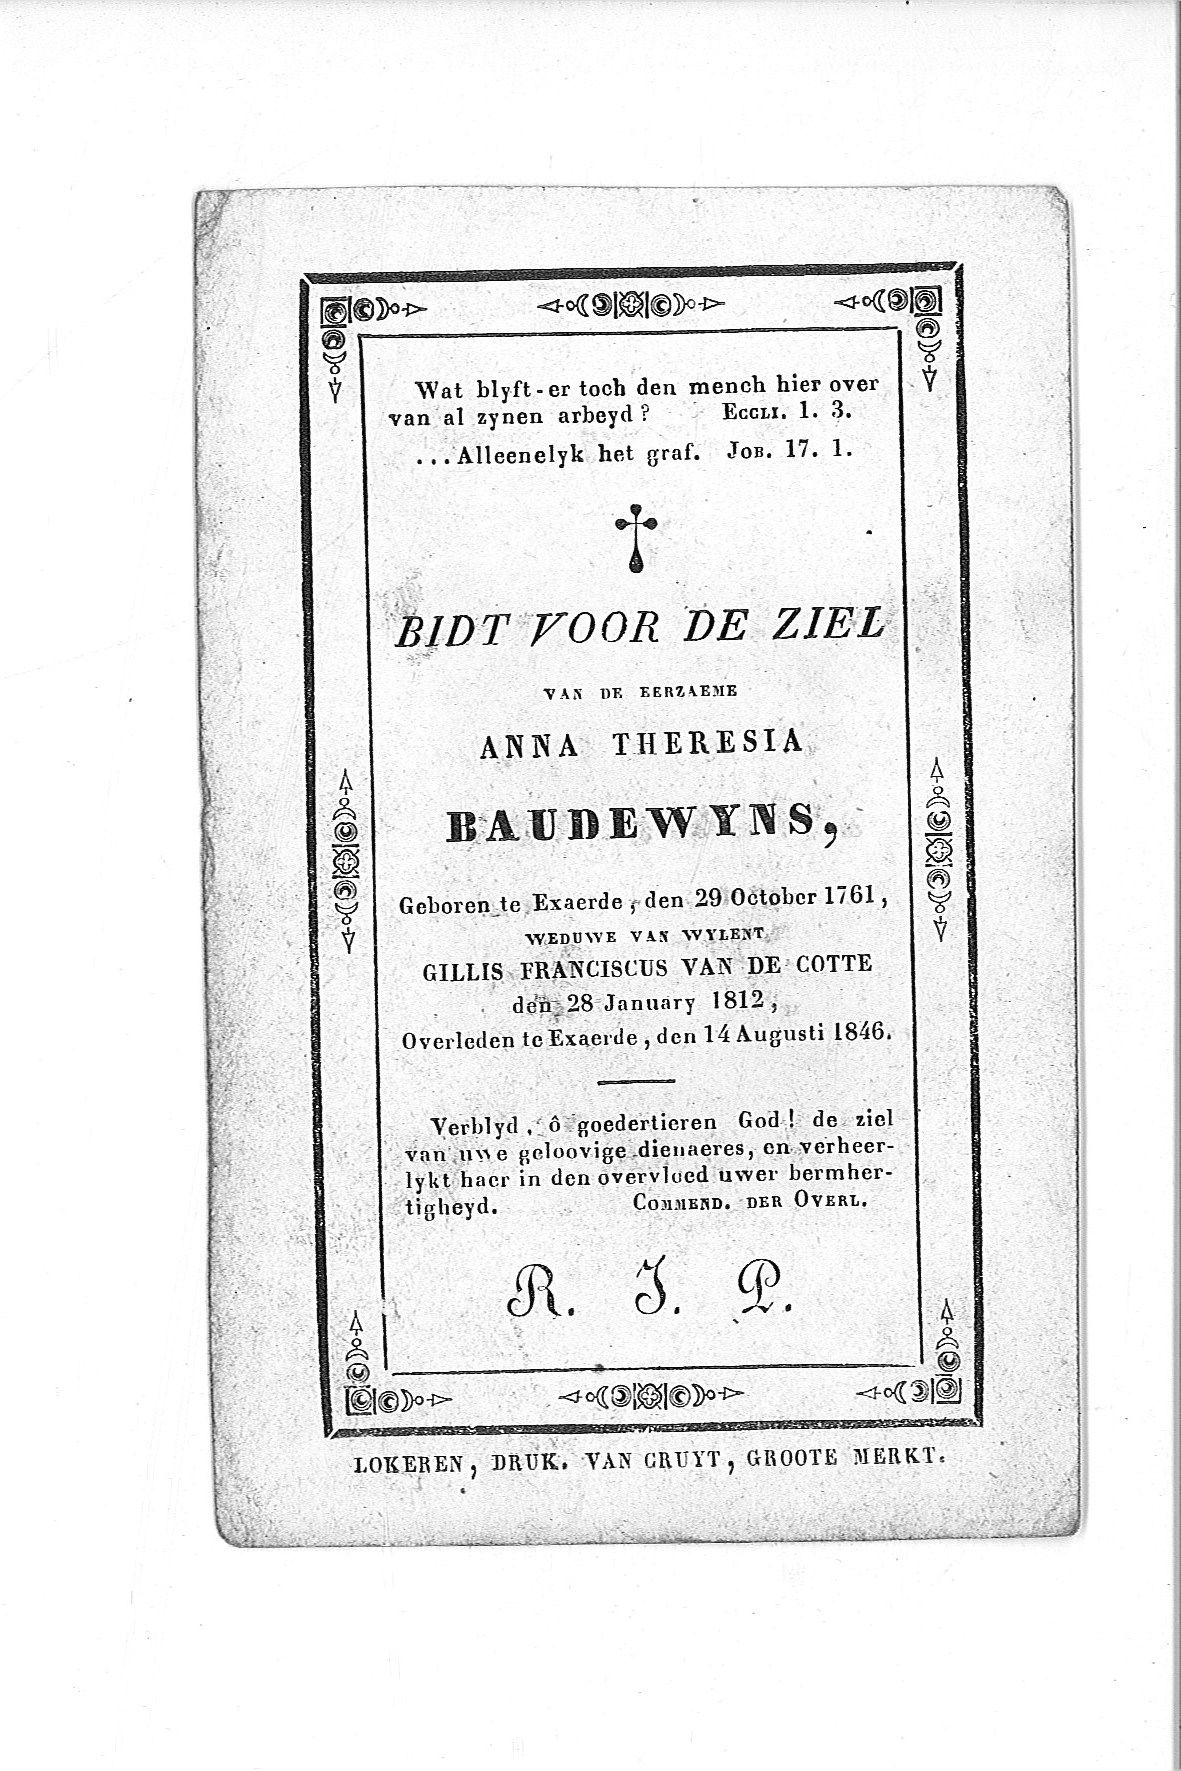 anna-theresia(1847)20090625104027_00016.jpg